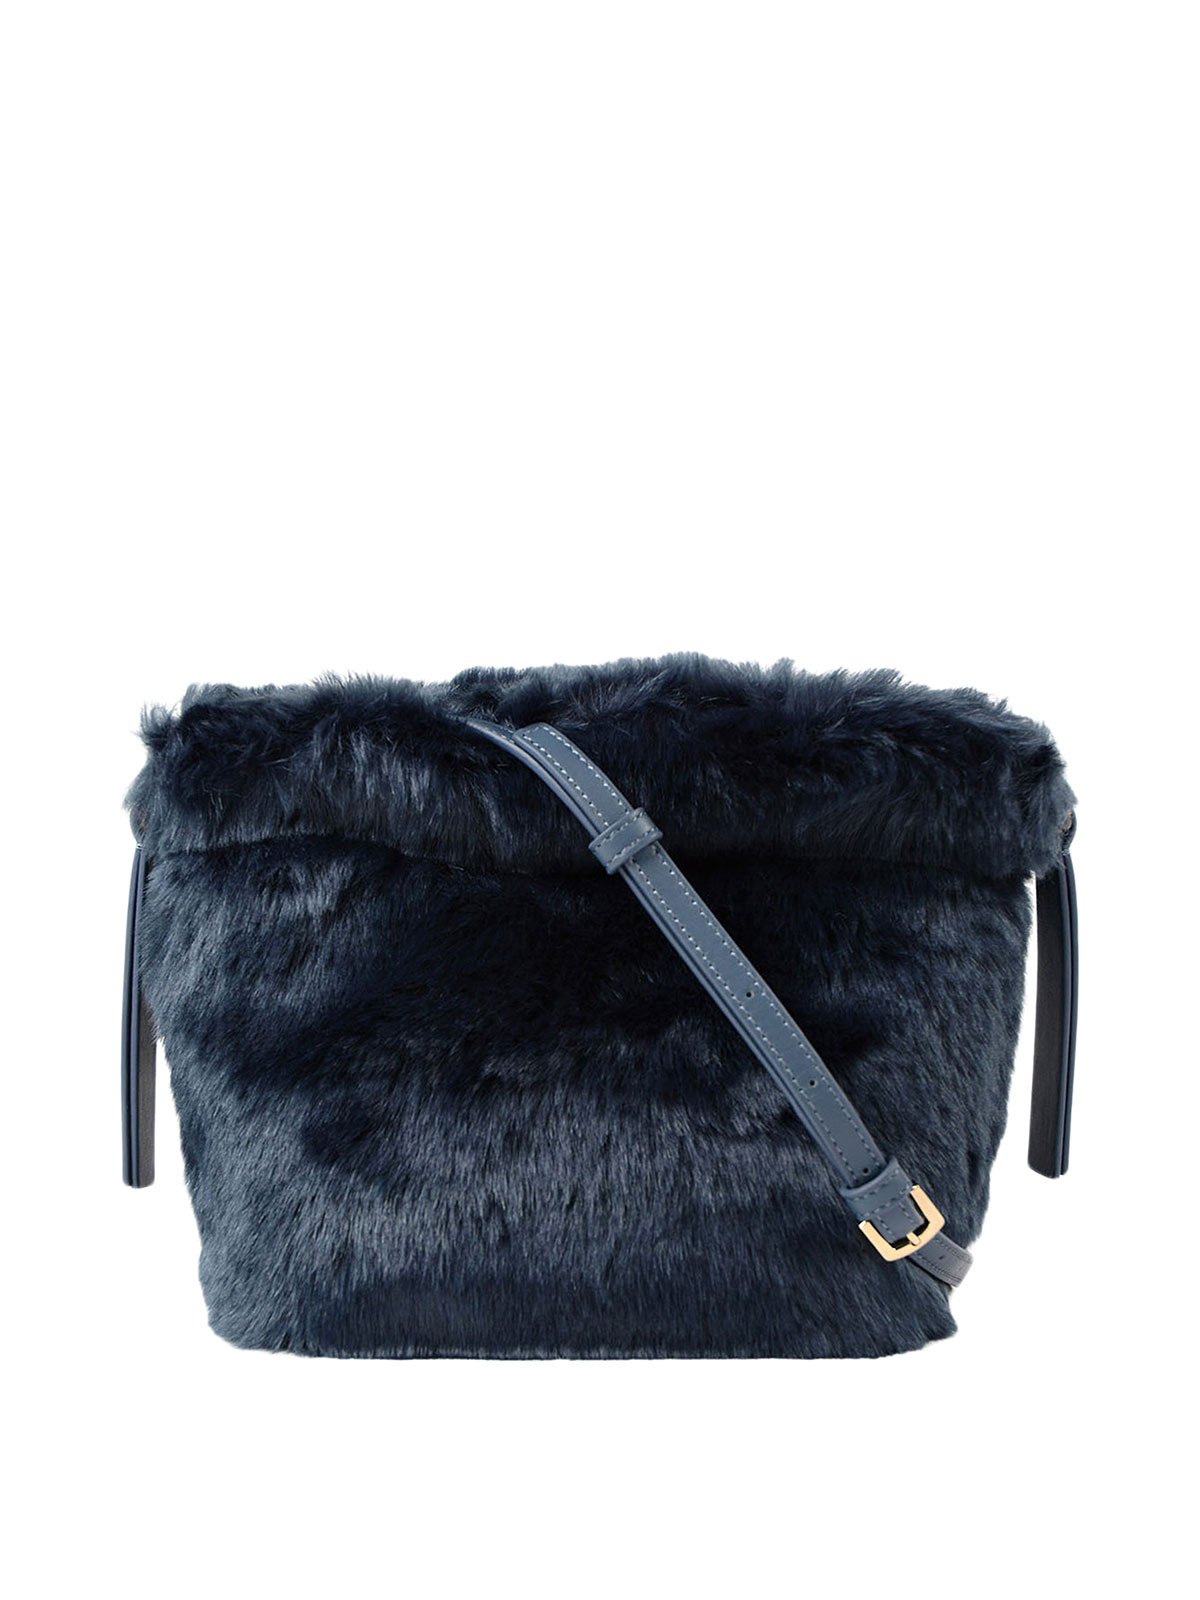 LUGGAGE - Beauty cases Furla wug8Pva